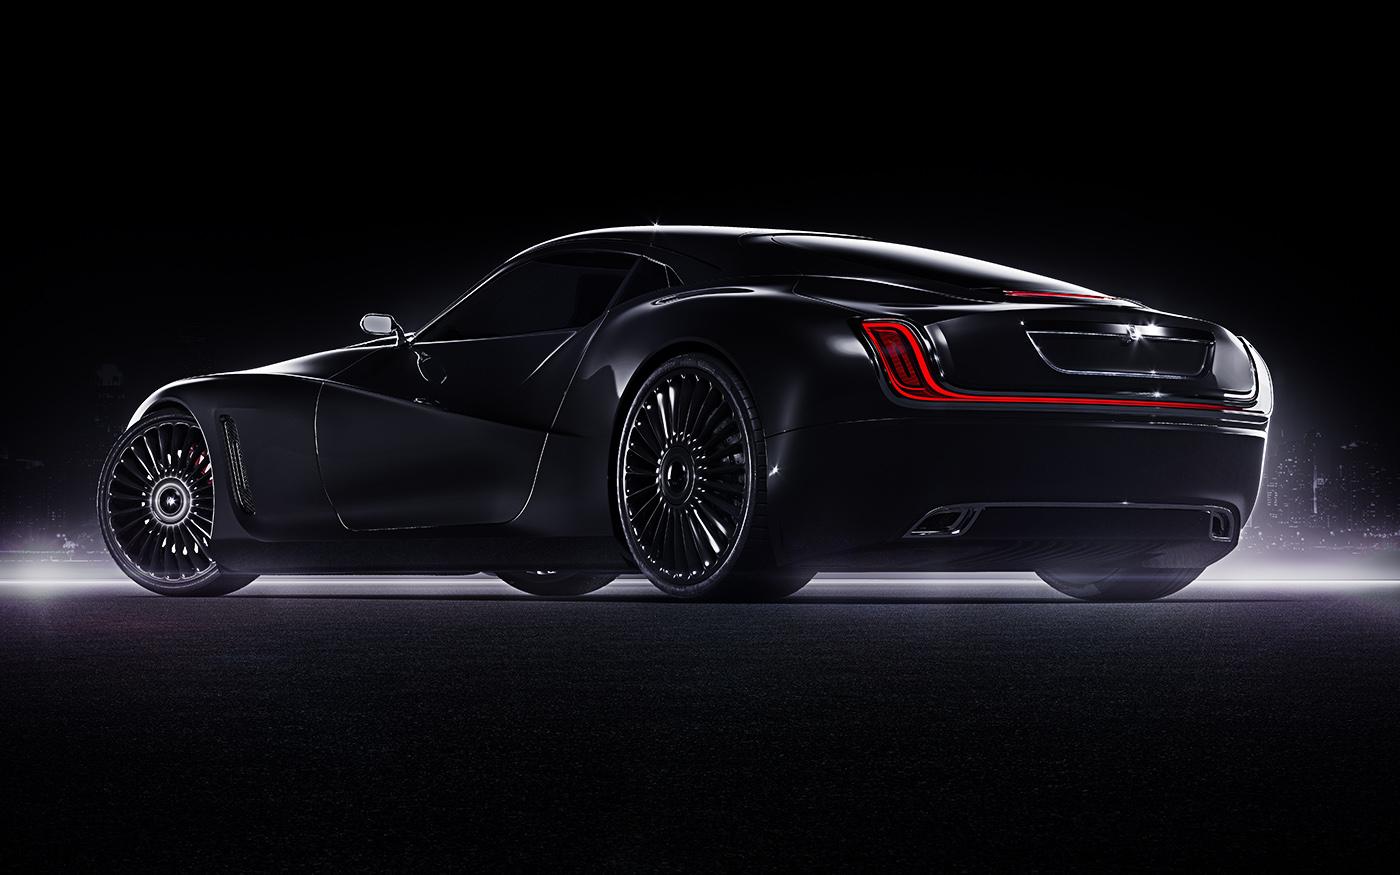 Rolls Royce luxury automotive design 3 w.jpg